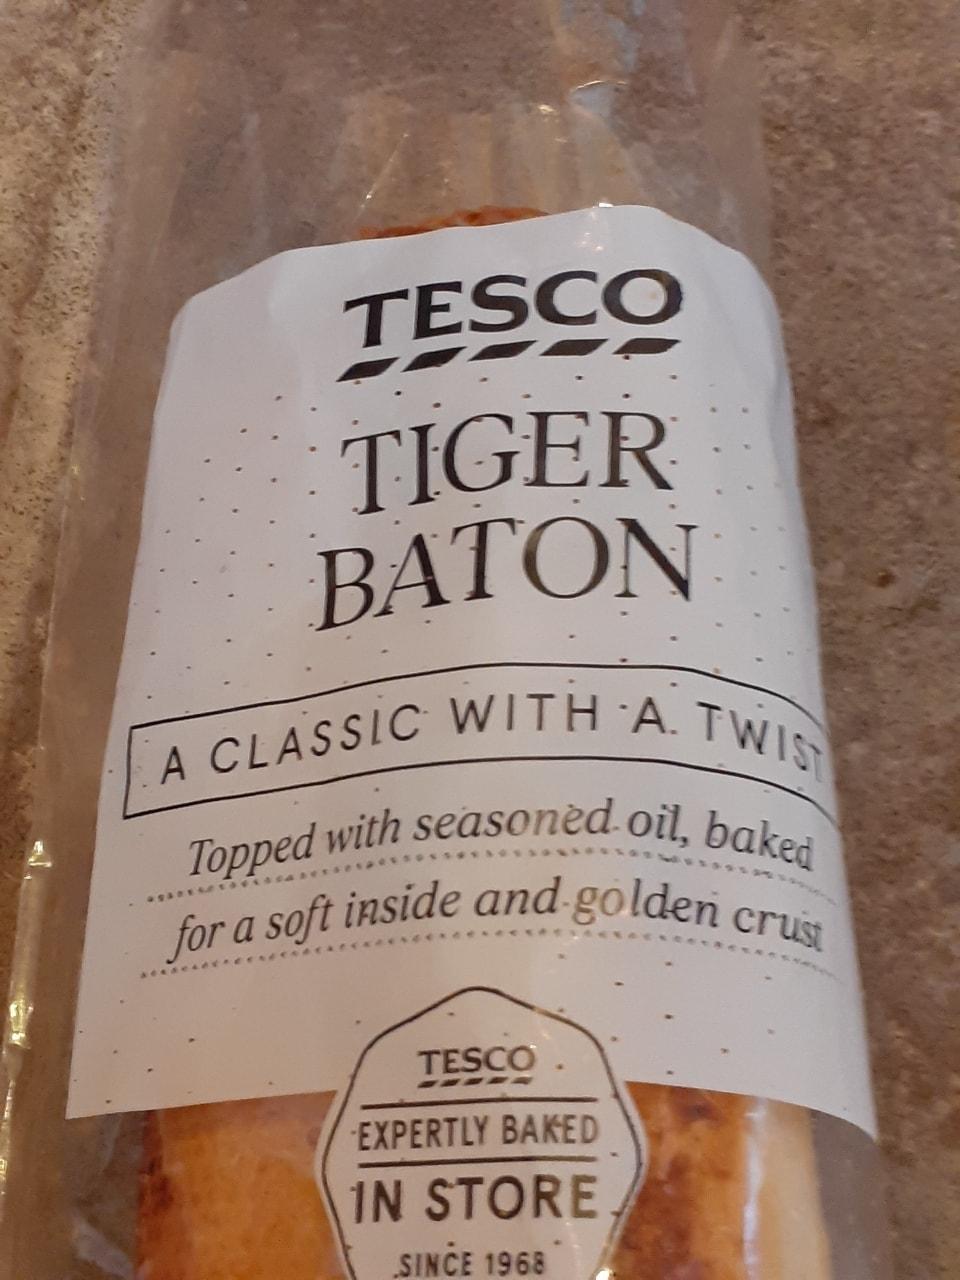 Tiger baton